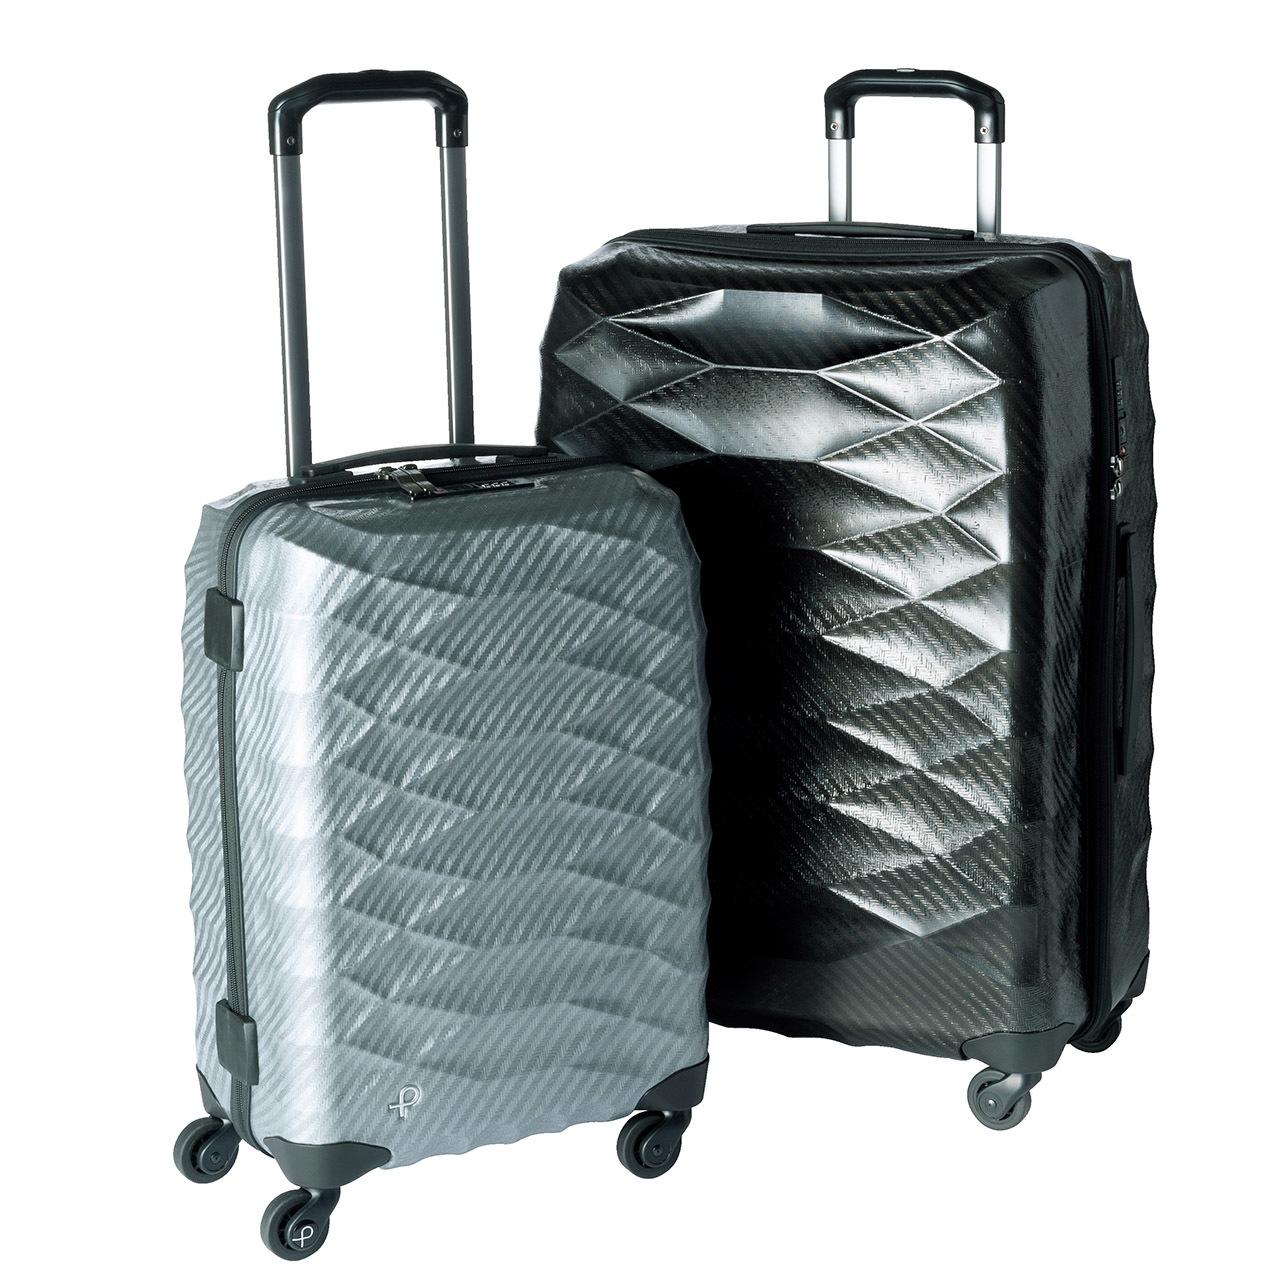 66d8986facf 「スーツケース」の記事一覧 | Web eclat | Jマダムのための50代ファッションサイト